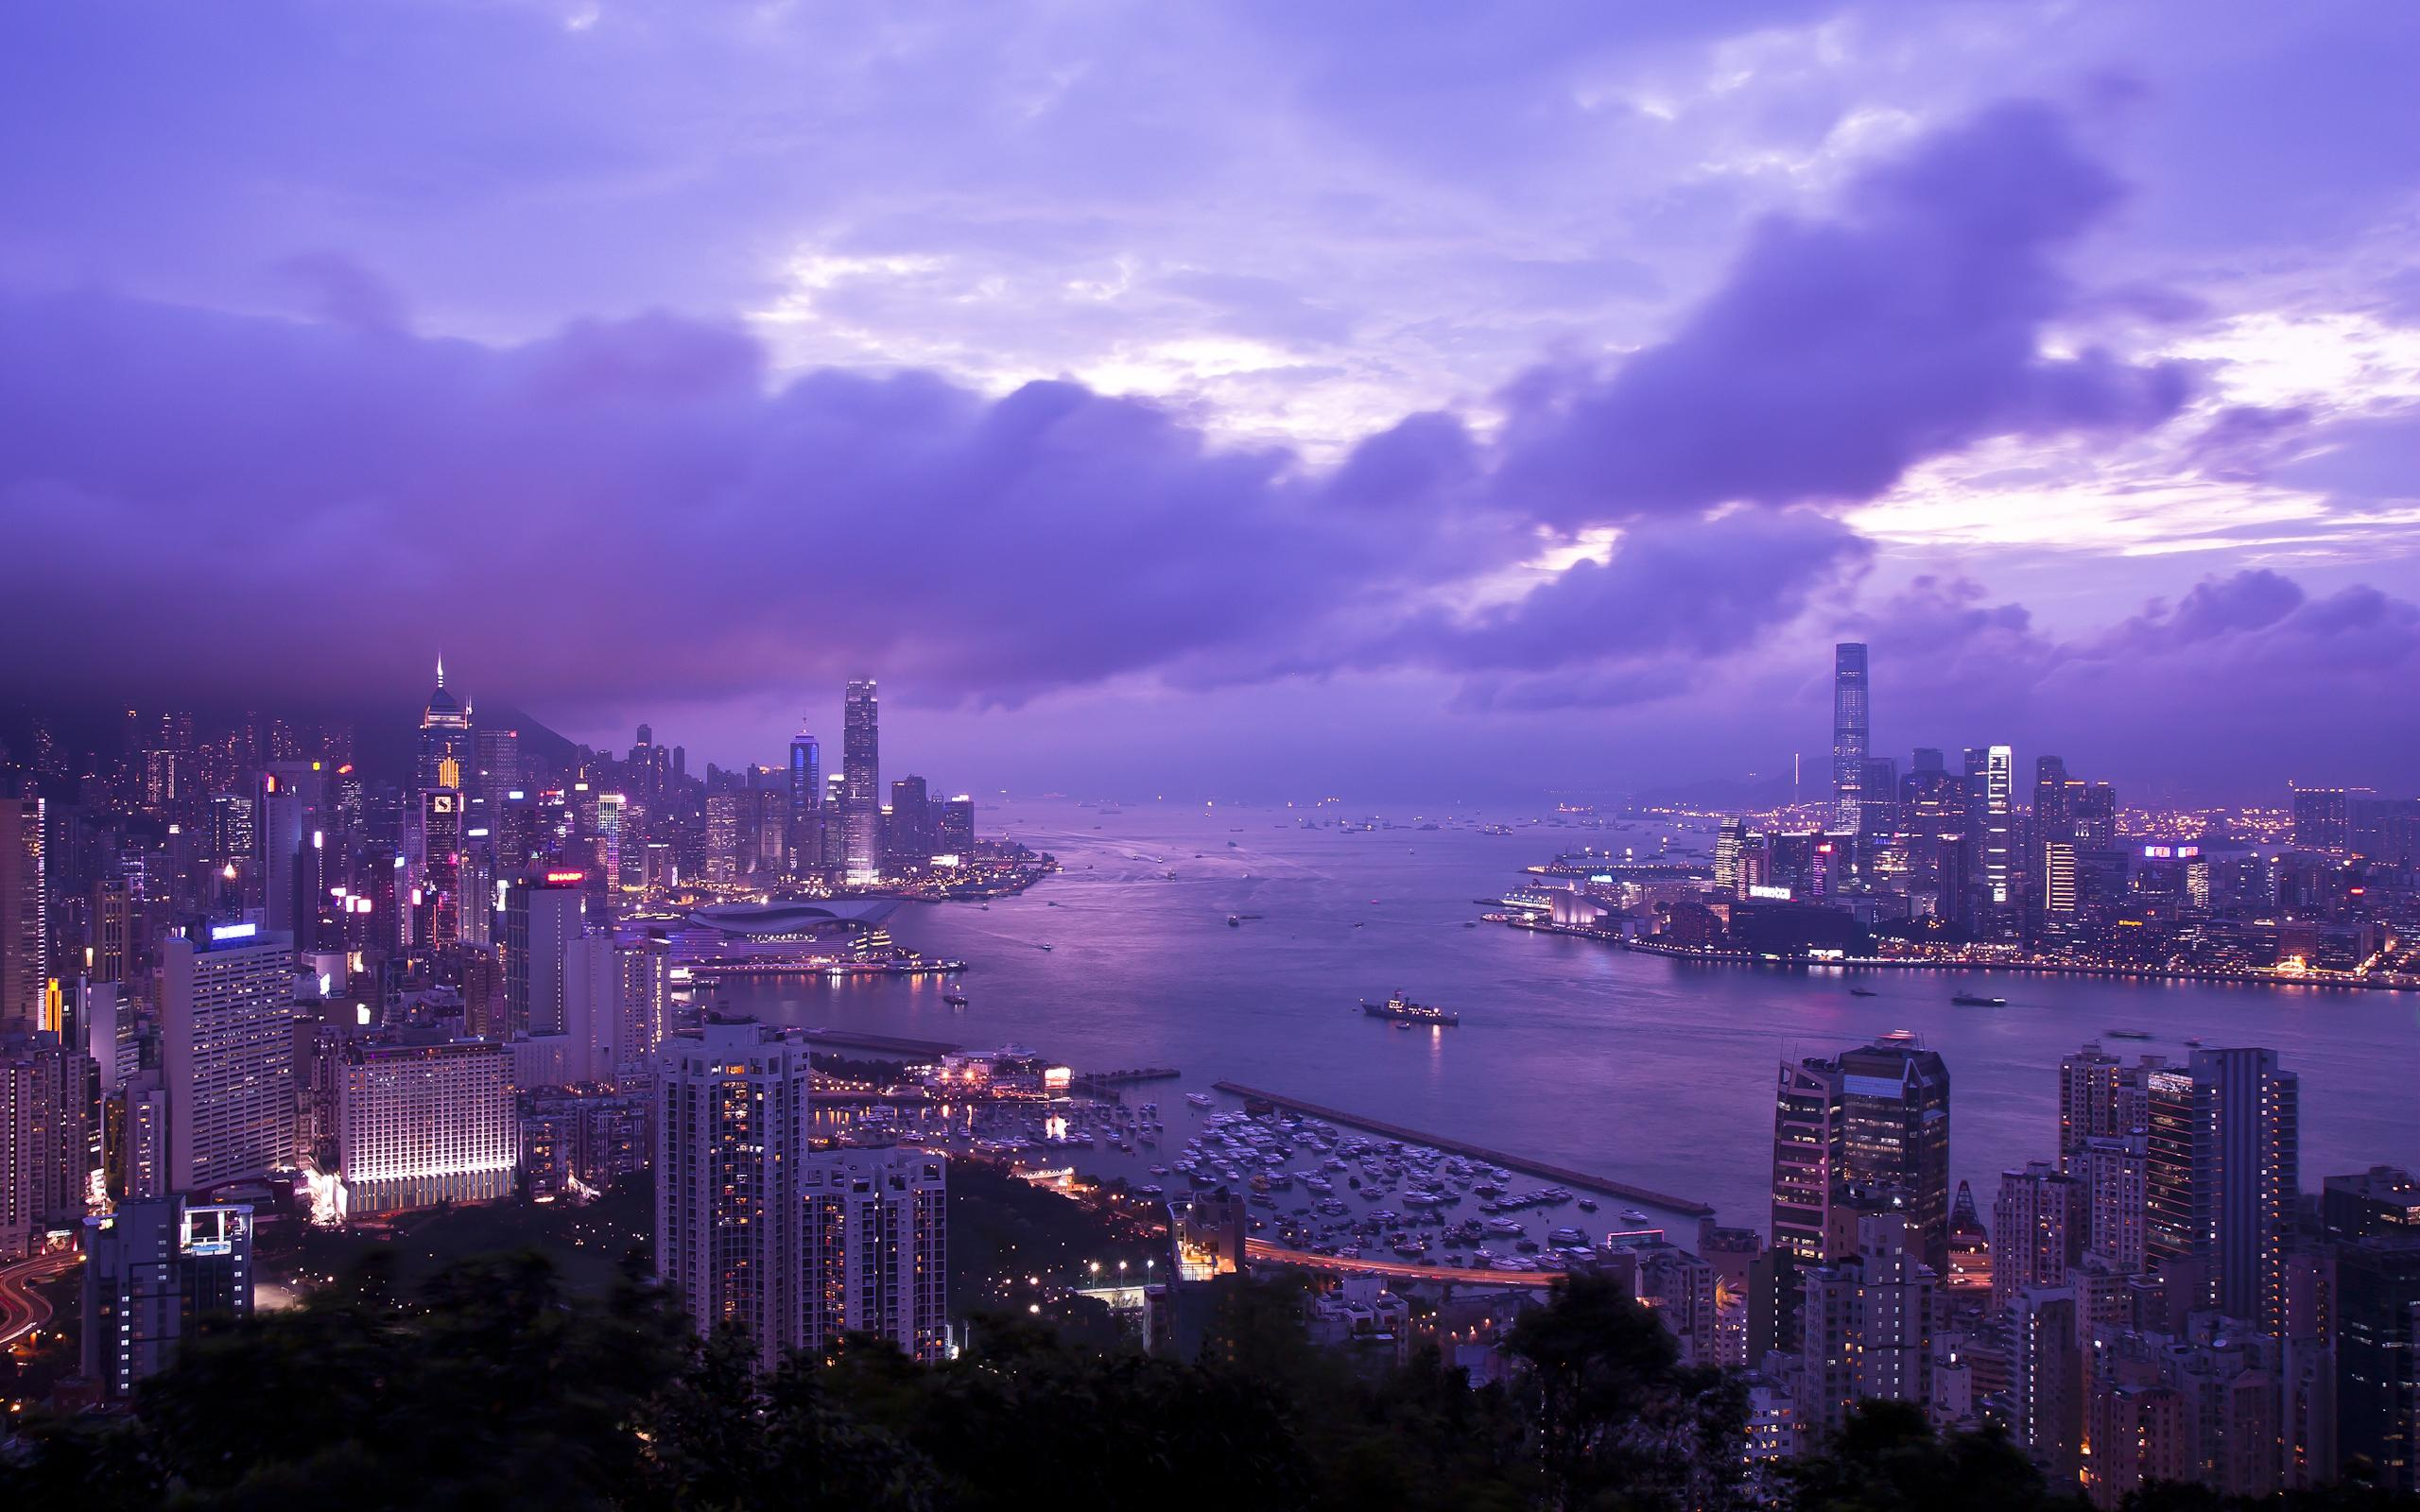 HD Harbor in Hong Kong Wallpaper Download   150092 2560x1600